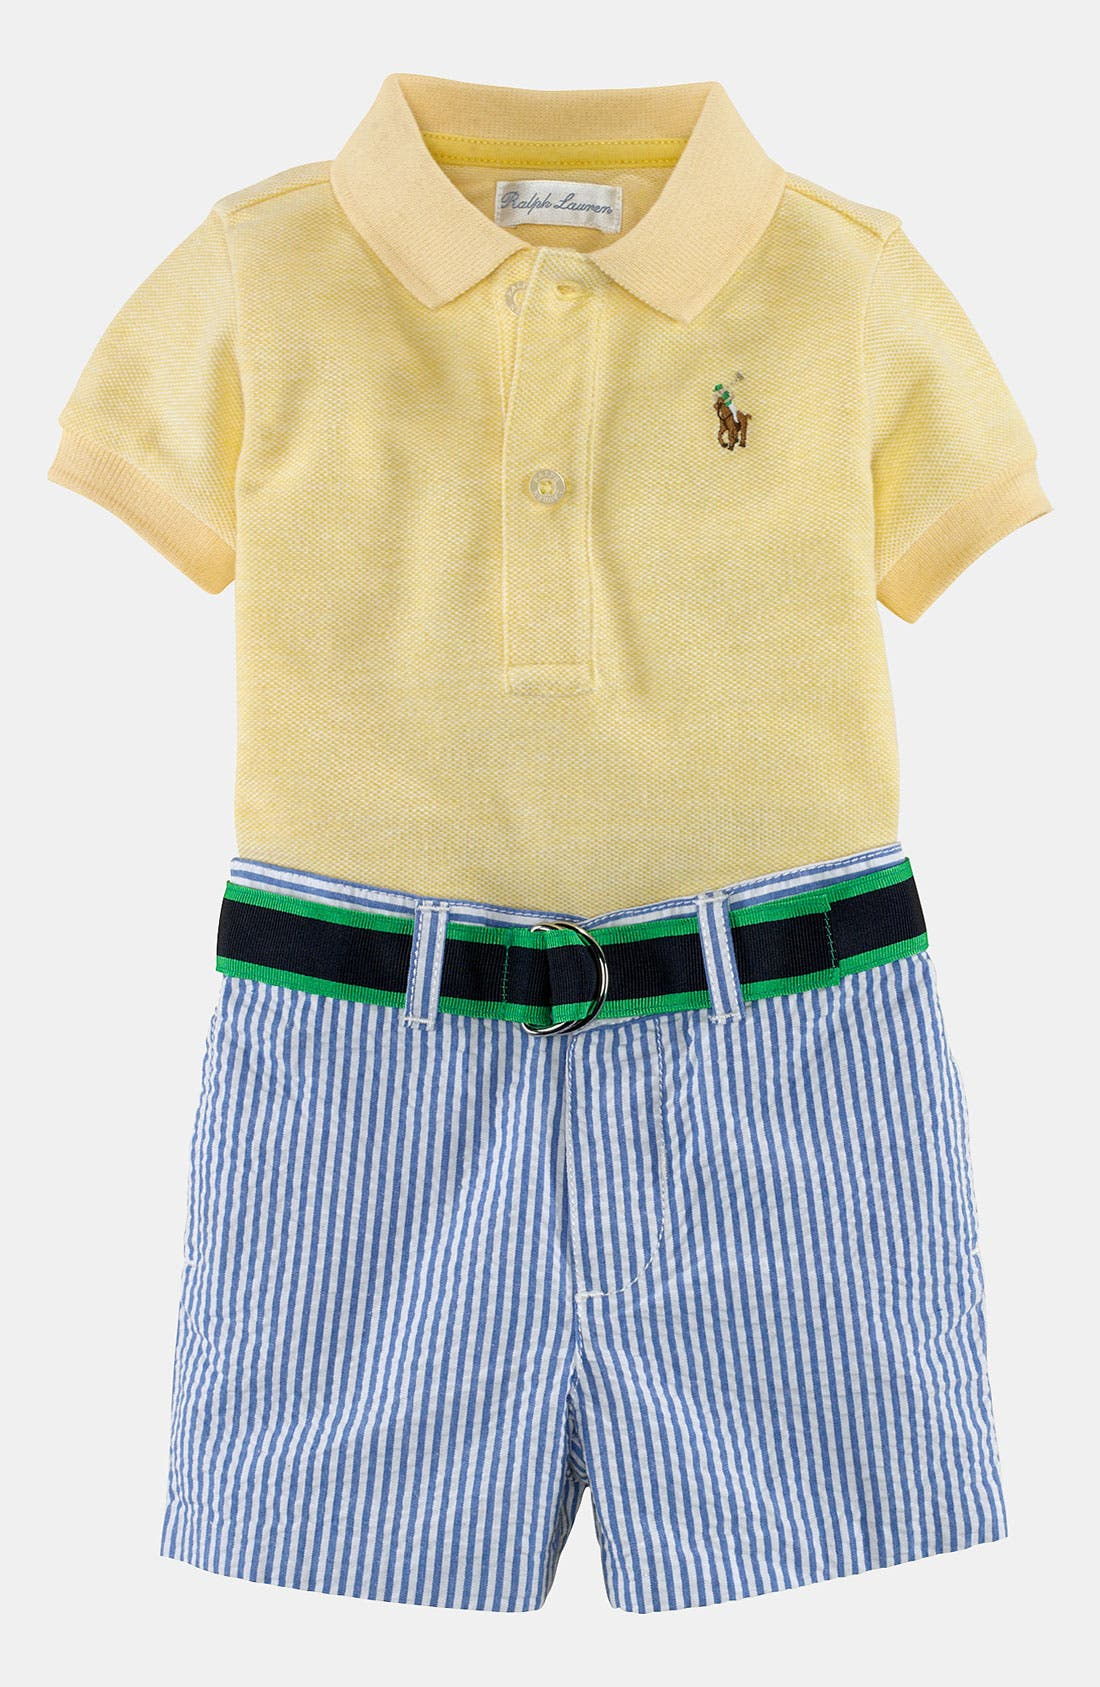 Alternate Image 2  - Ralph Lauren Polo & Shorts (Baby)